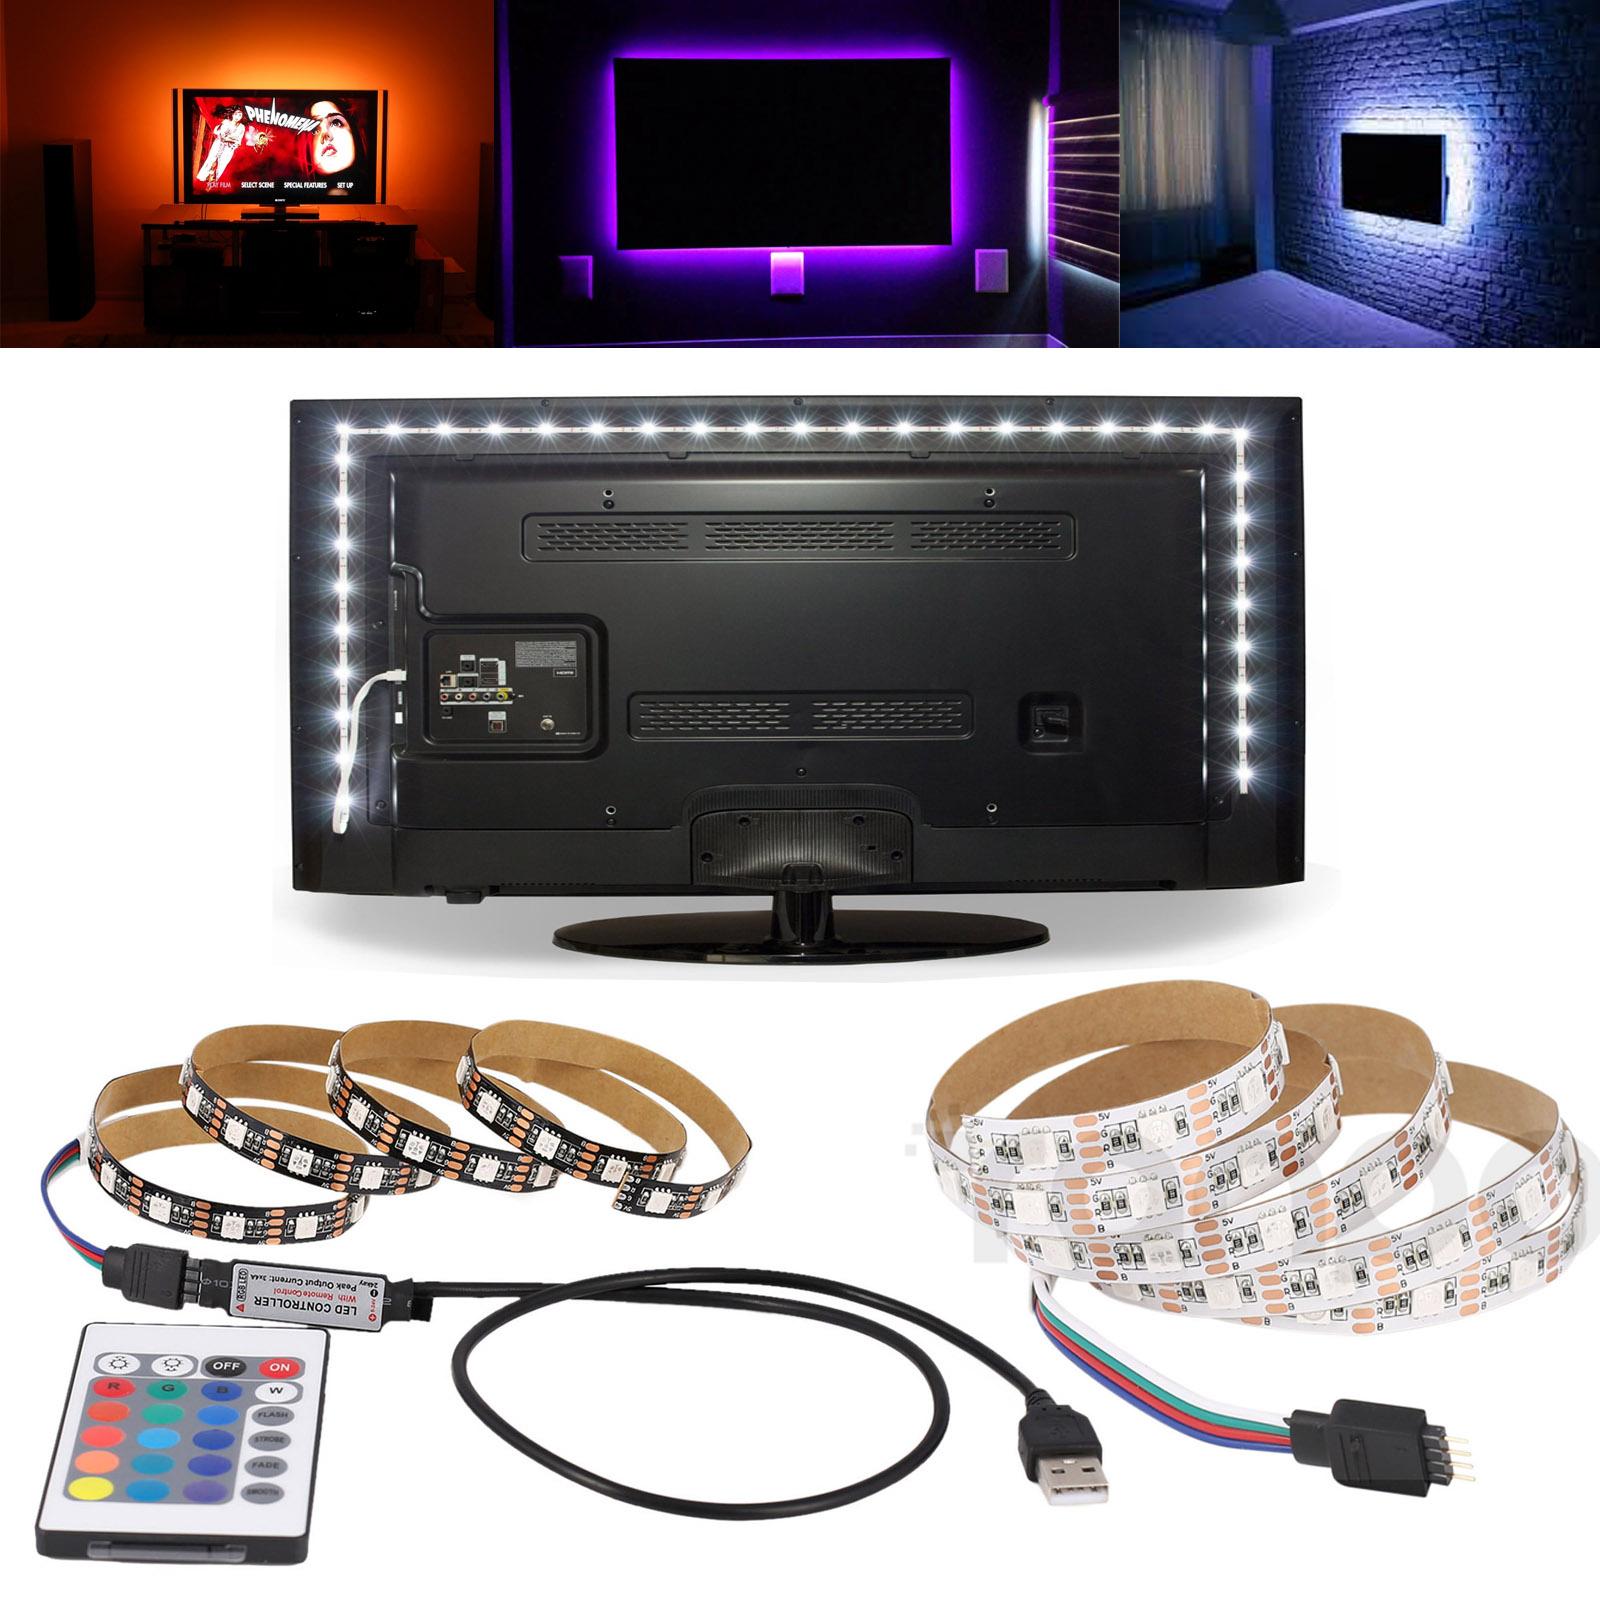 USB LED Strip Lights Flex 42 Options From 0,5-5m TV Background USB Lighting